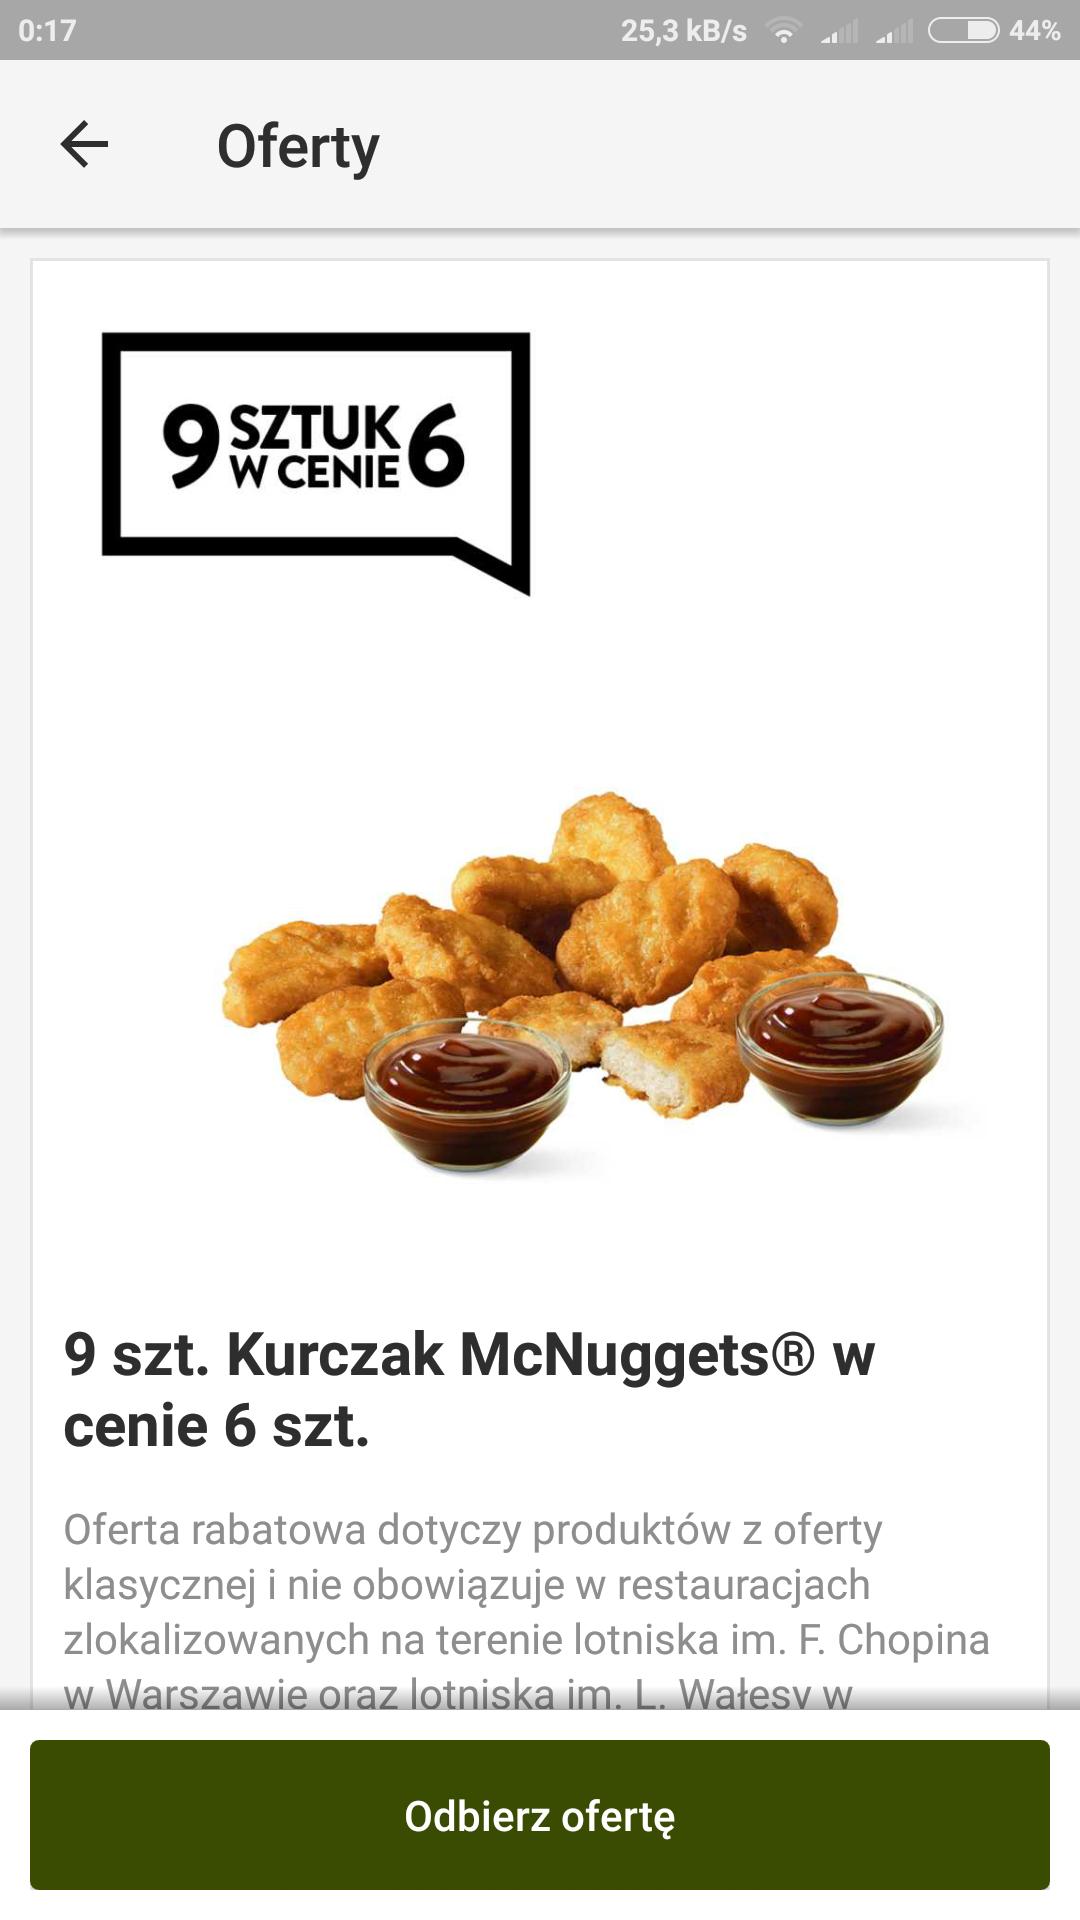 McDonald's 9 sztuk kurczak mc nuggets w cenie 6